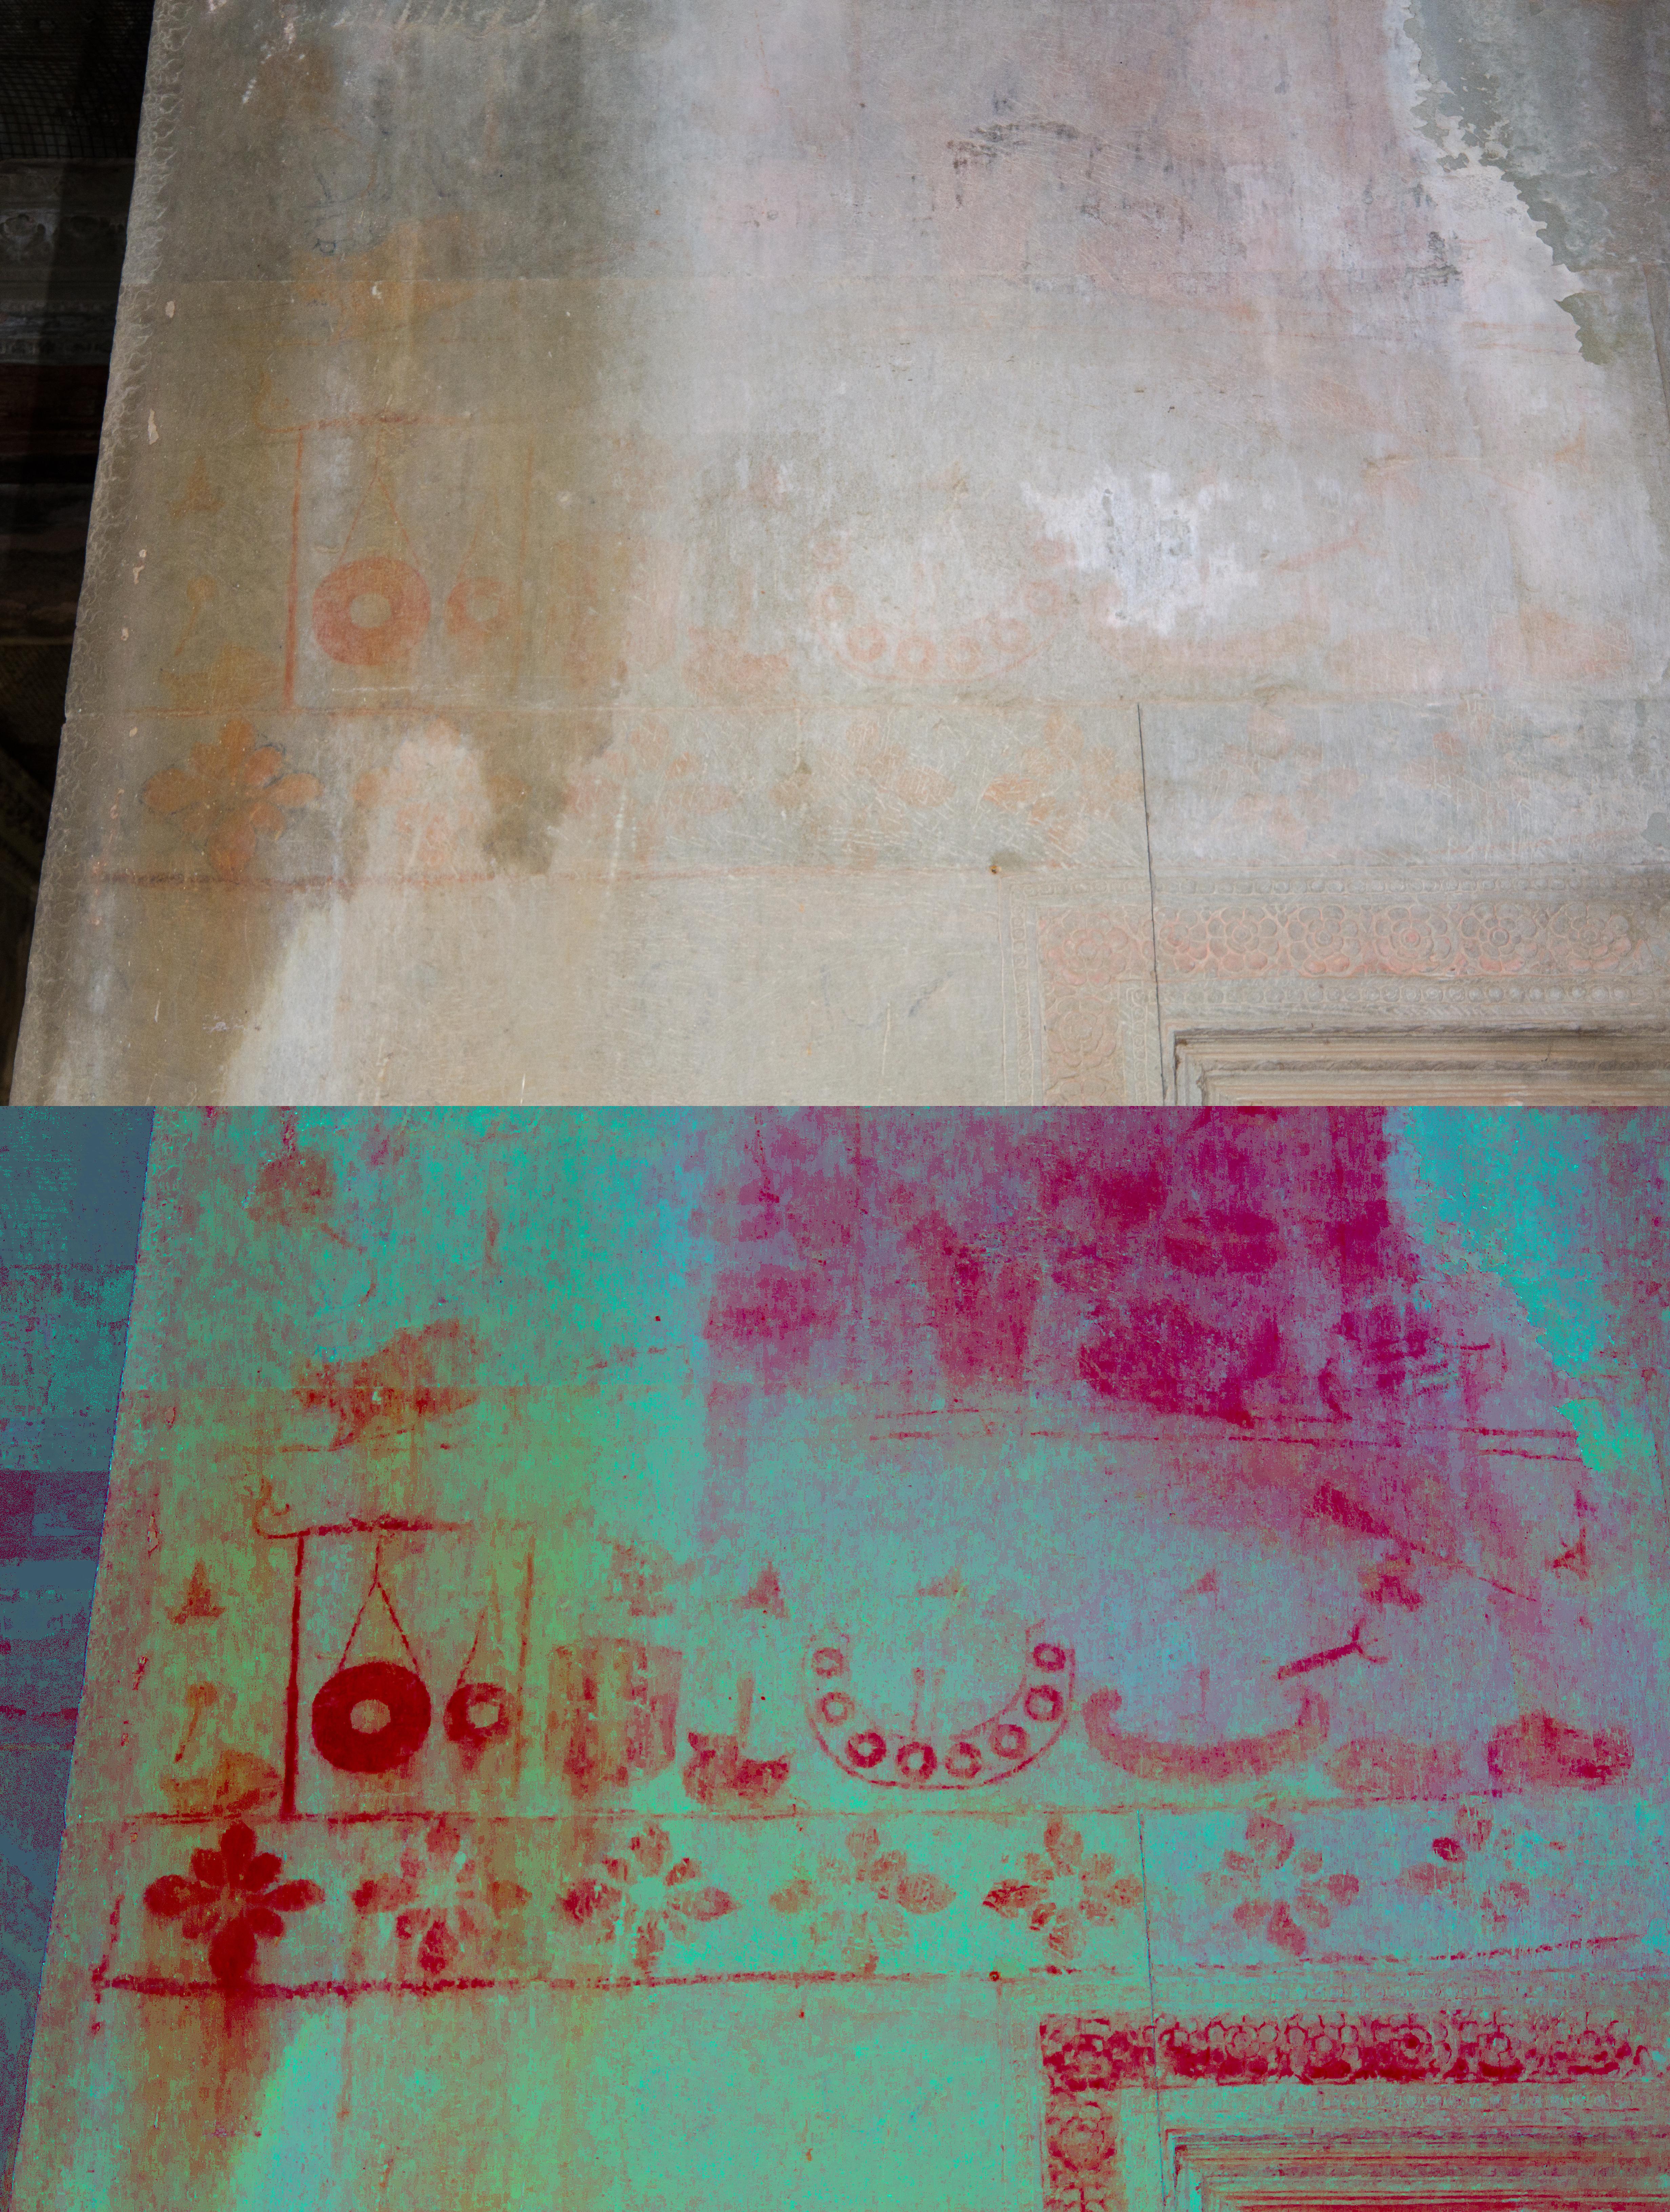 Top: plain view; bottom: after decorrelation stretch analysis digital enhancement